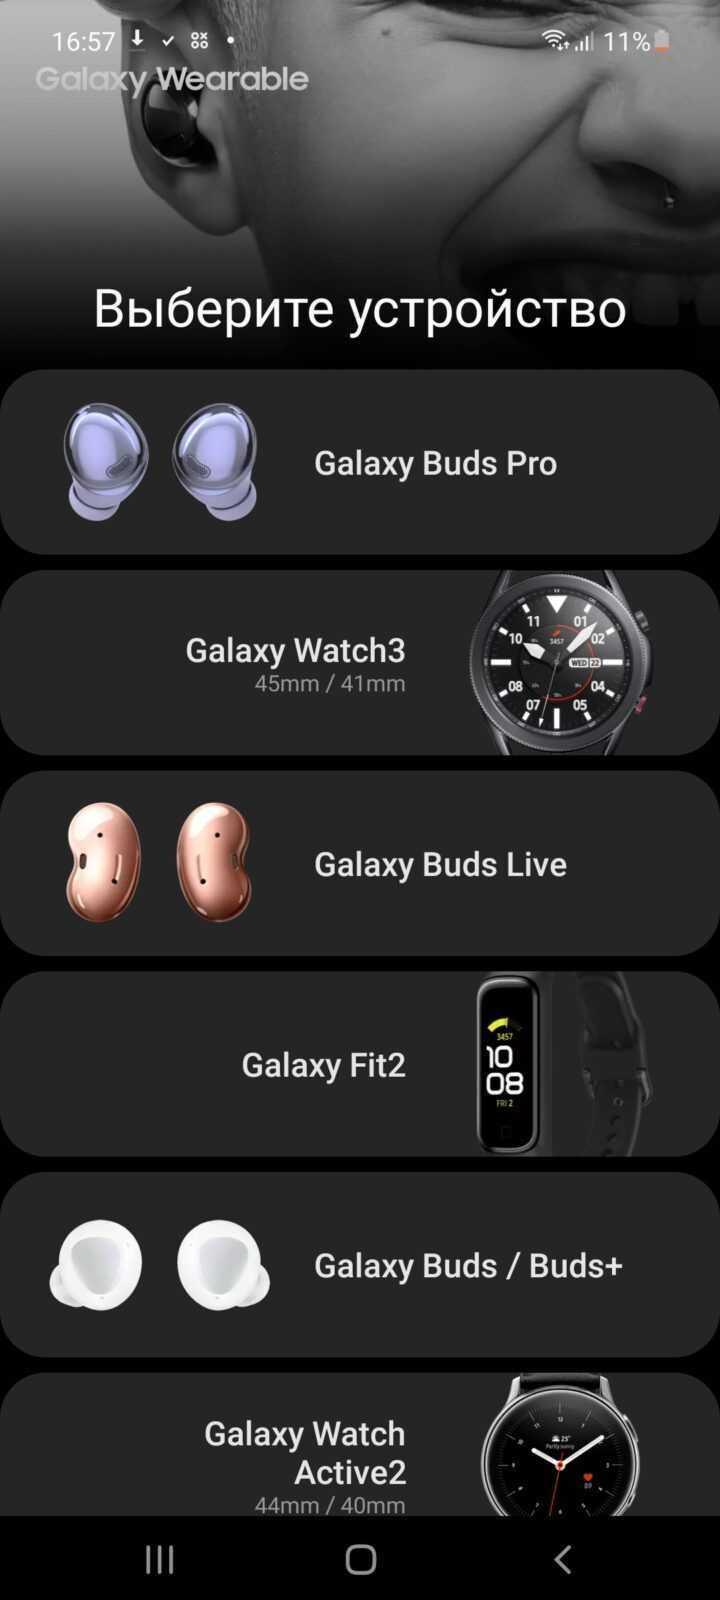 Обзор наушников Samsung Galaxy Buds Pro: звук со стилем (screenshot 20210502 165715 galaxy wearable)